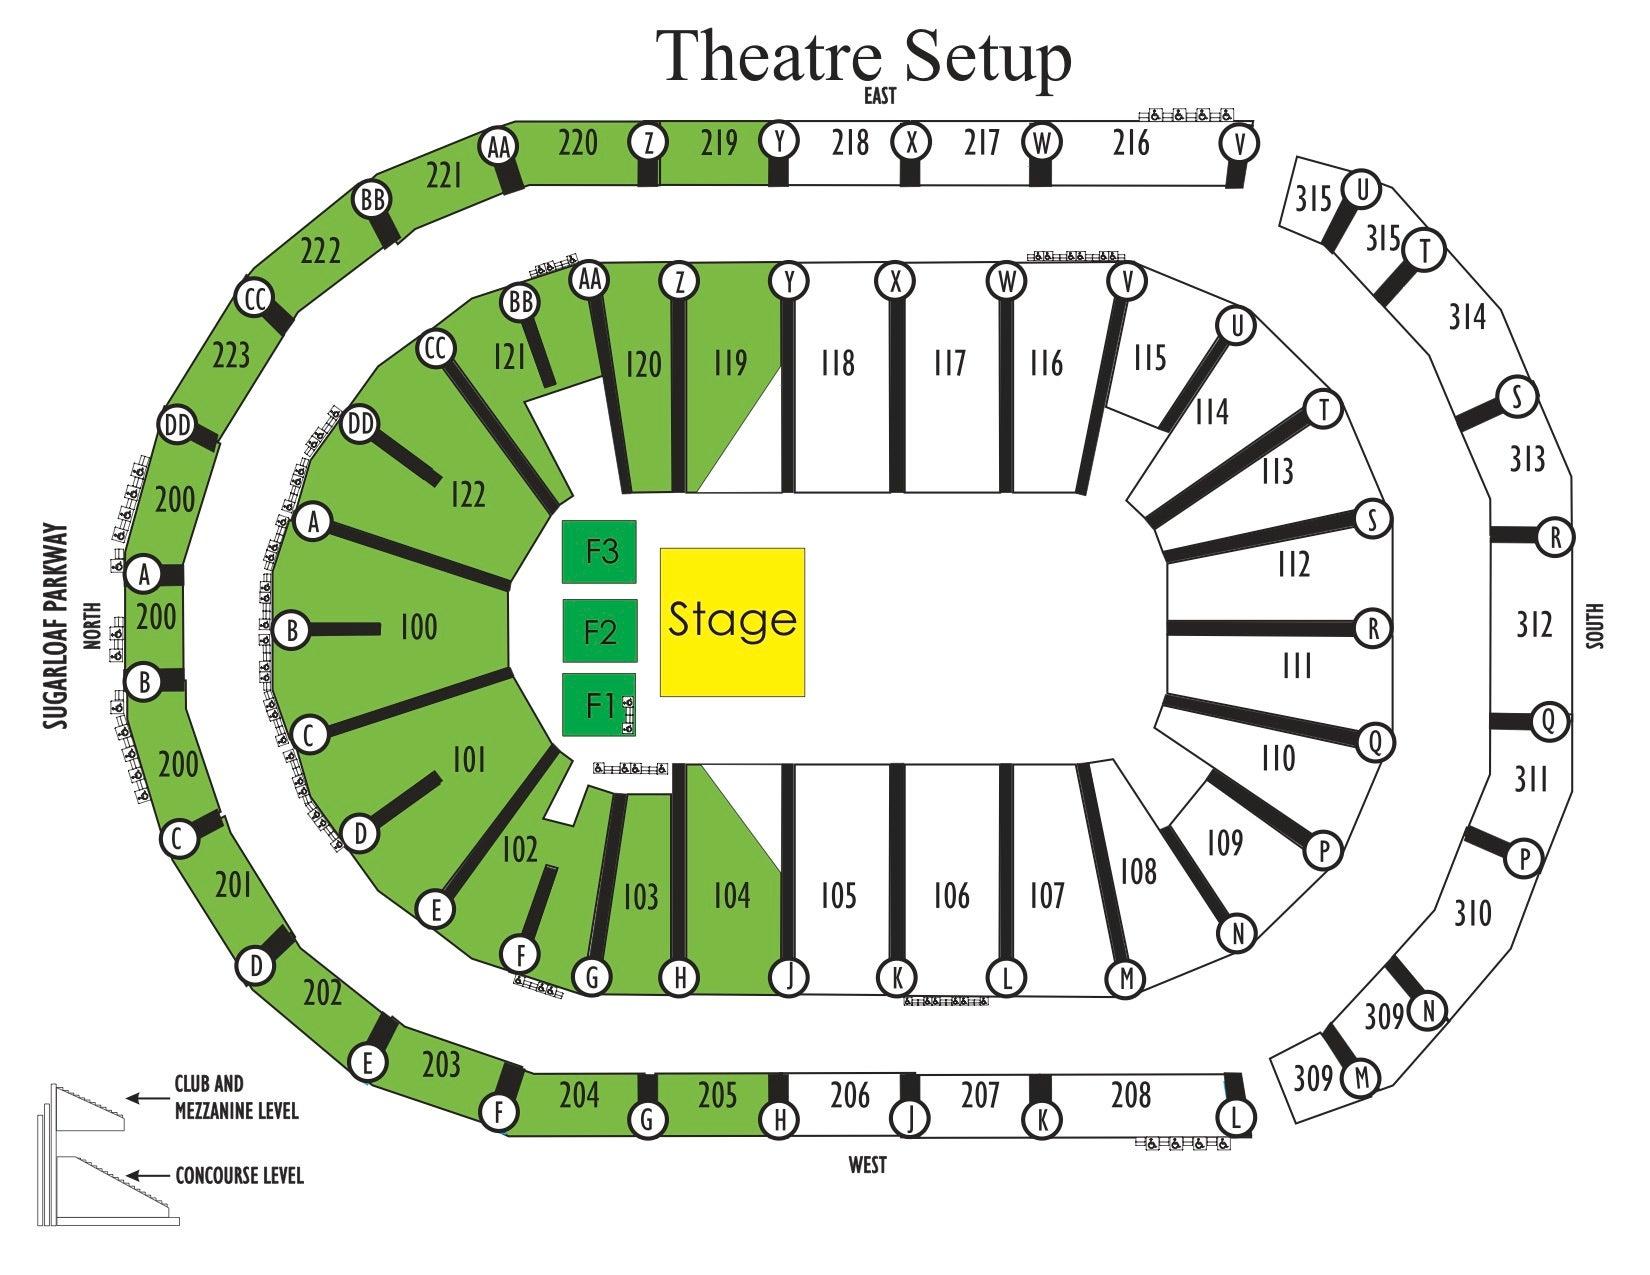 Theatre Setup